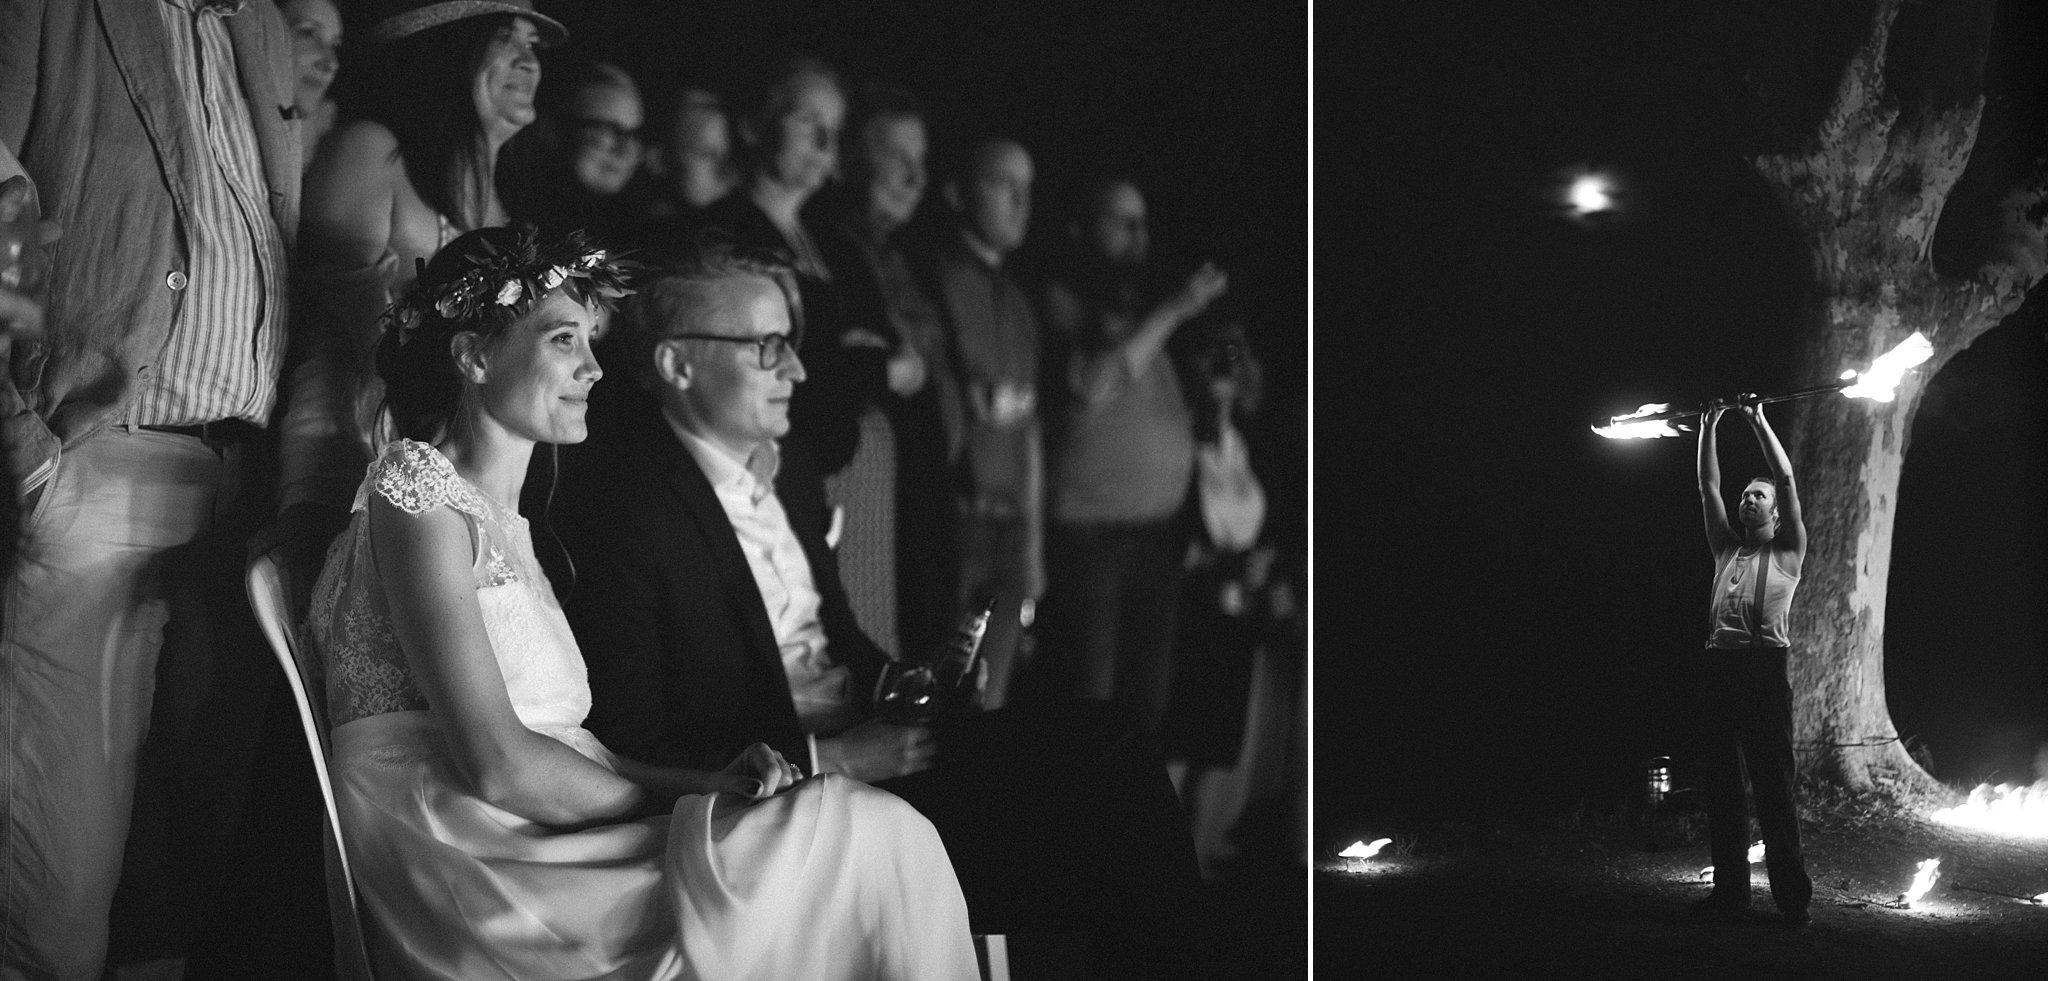 Wedding Photographer Perpignan - Château Las Collas Wedding - Hugo Hennequin115.jpg